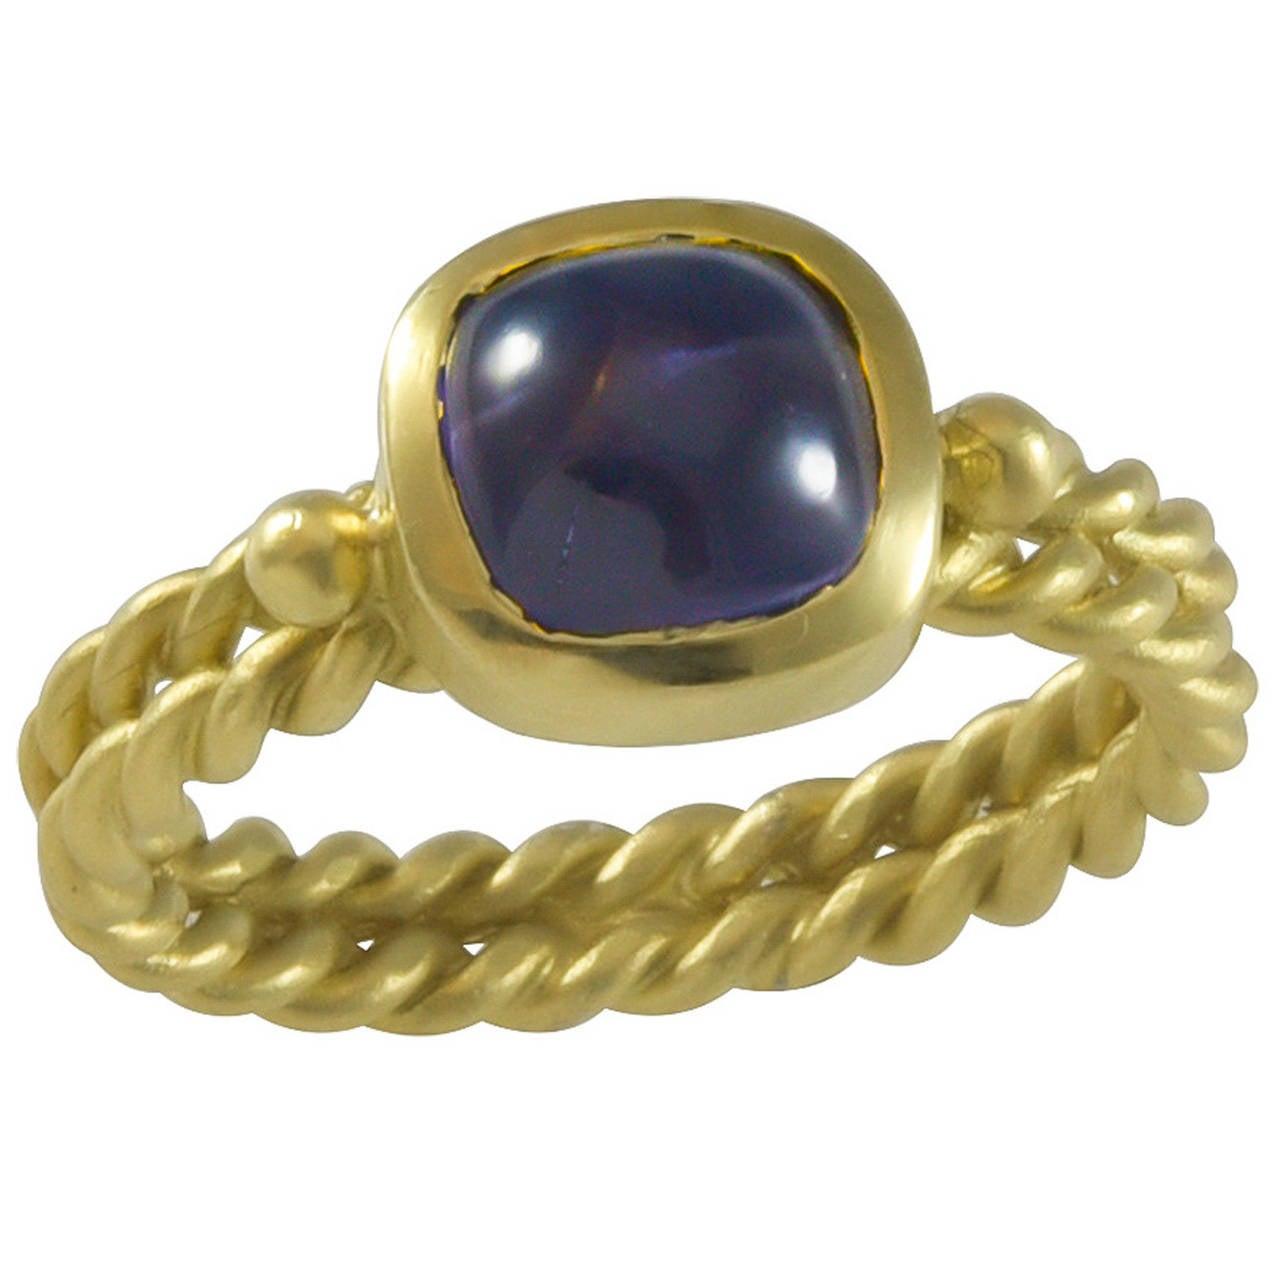 Mazza Cabochon Amethyst Brushed Gold Ring